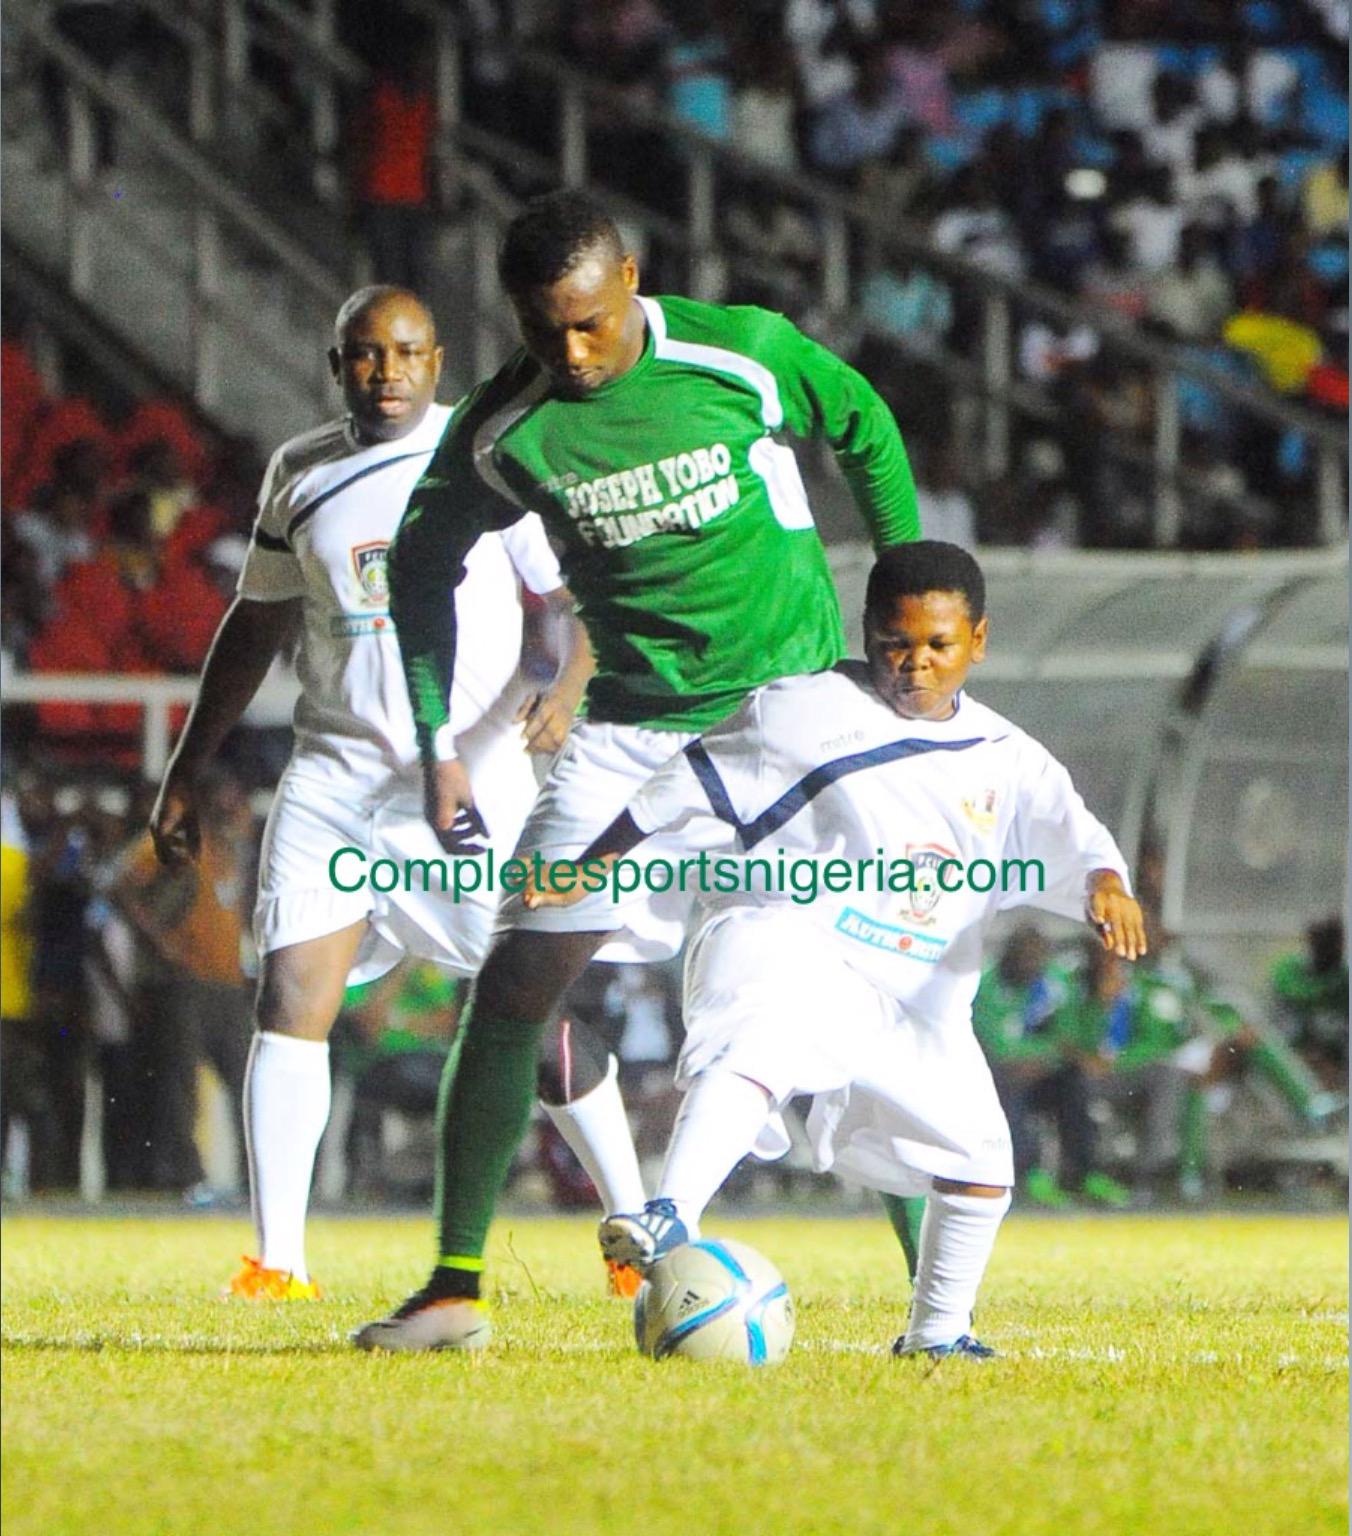 Yobo Testimonial: Emenike Bags Hat-trick, Paw Paw Scores As Nigeria XI Win